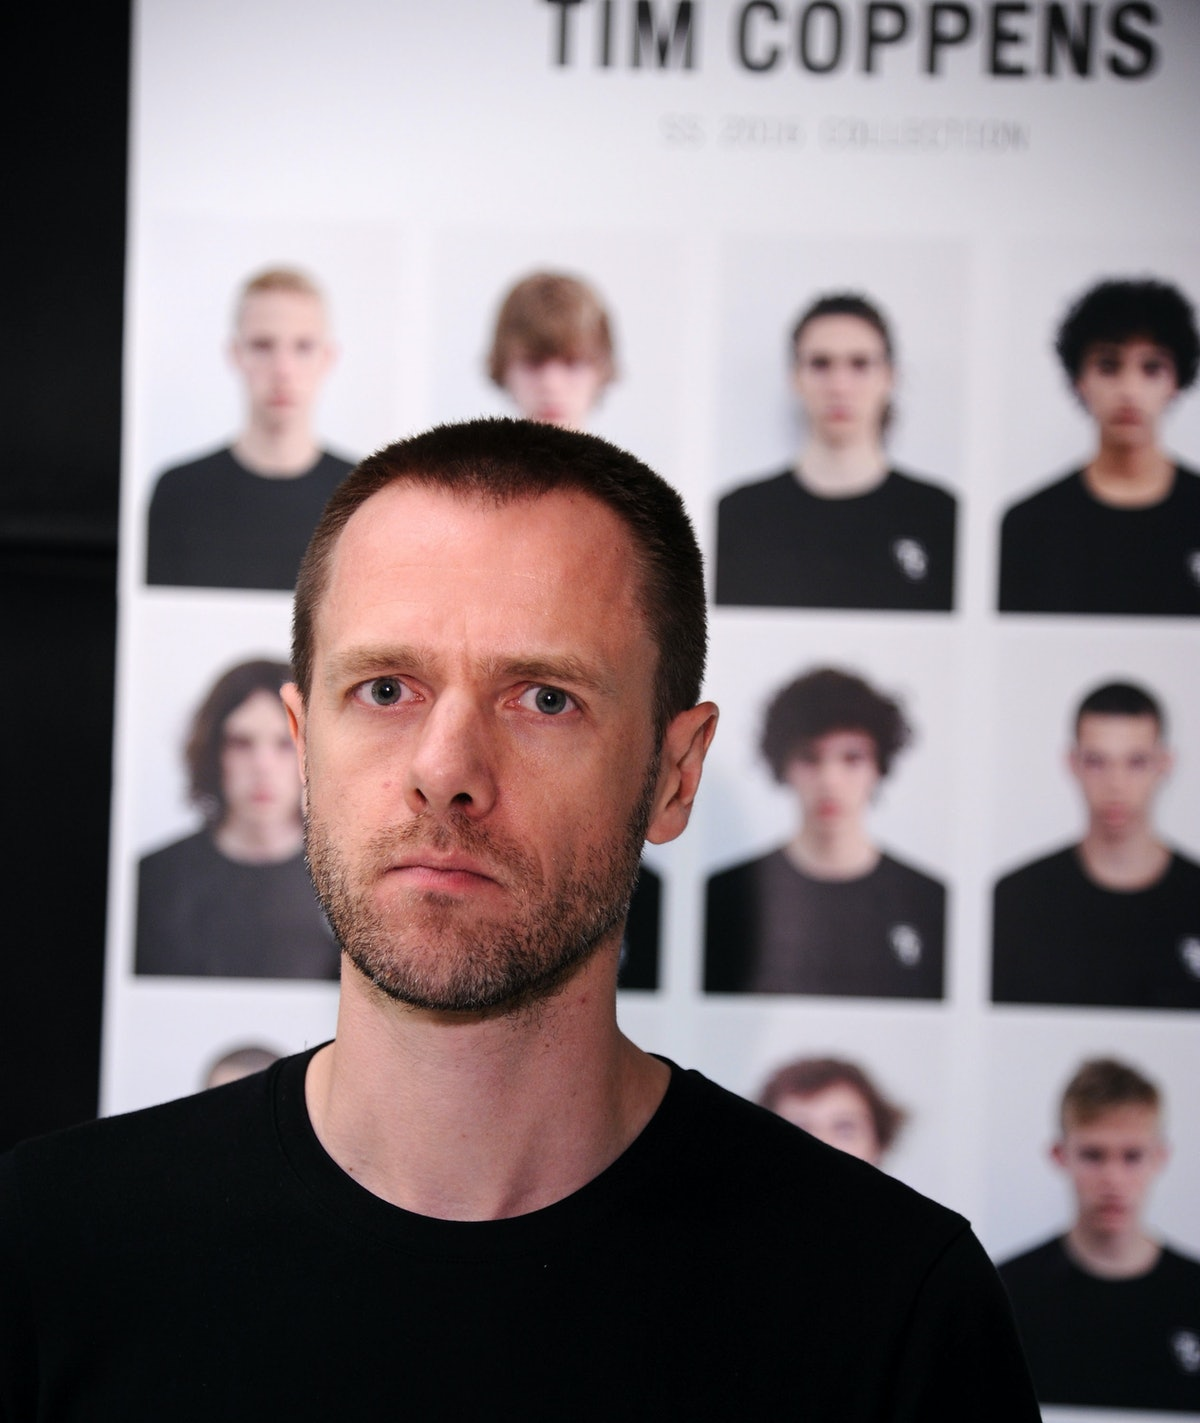 Tim Coppens - Backstage - New York Fashion Week: Men's S/S 2016